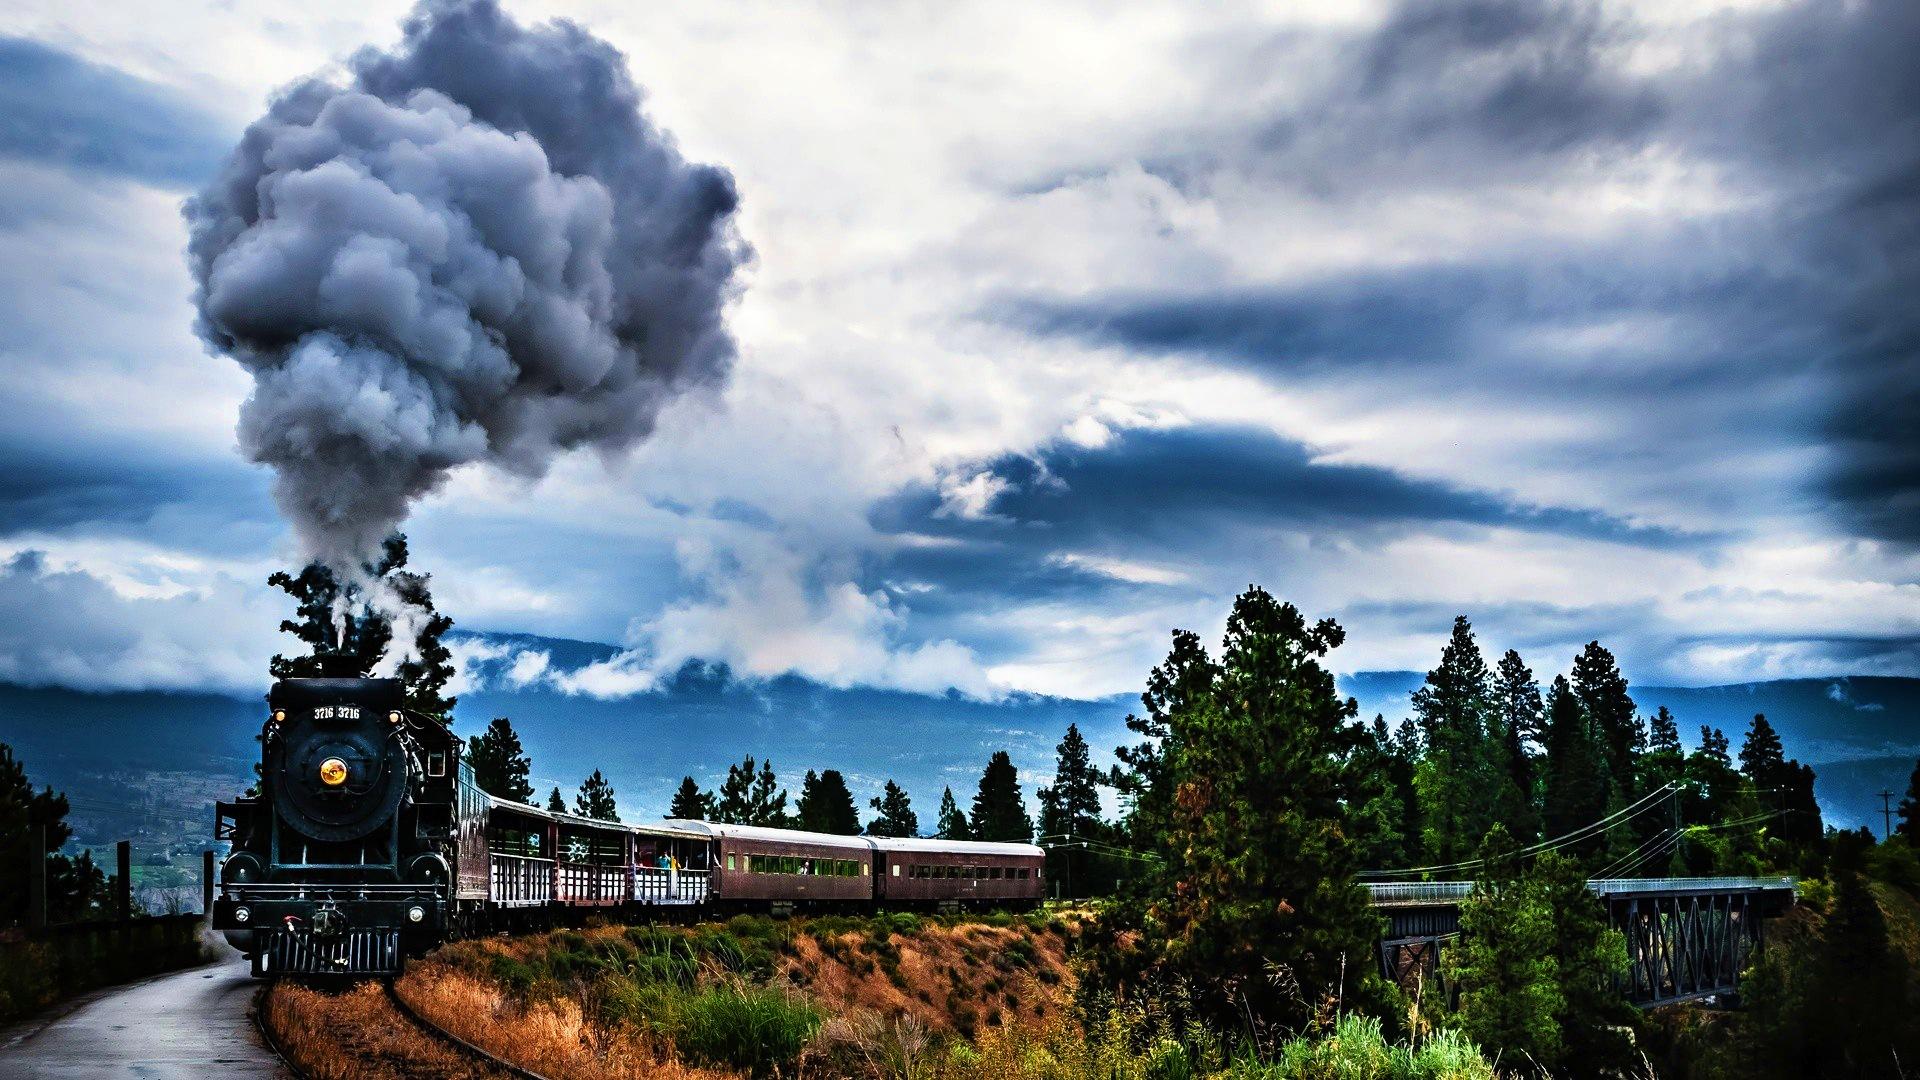 Steam-Locomotive-wallpaper-wp34011031